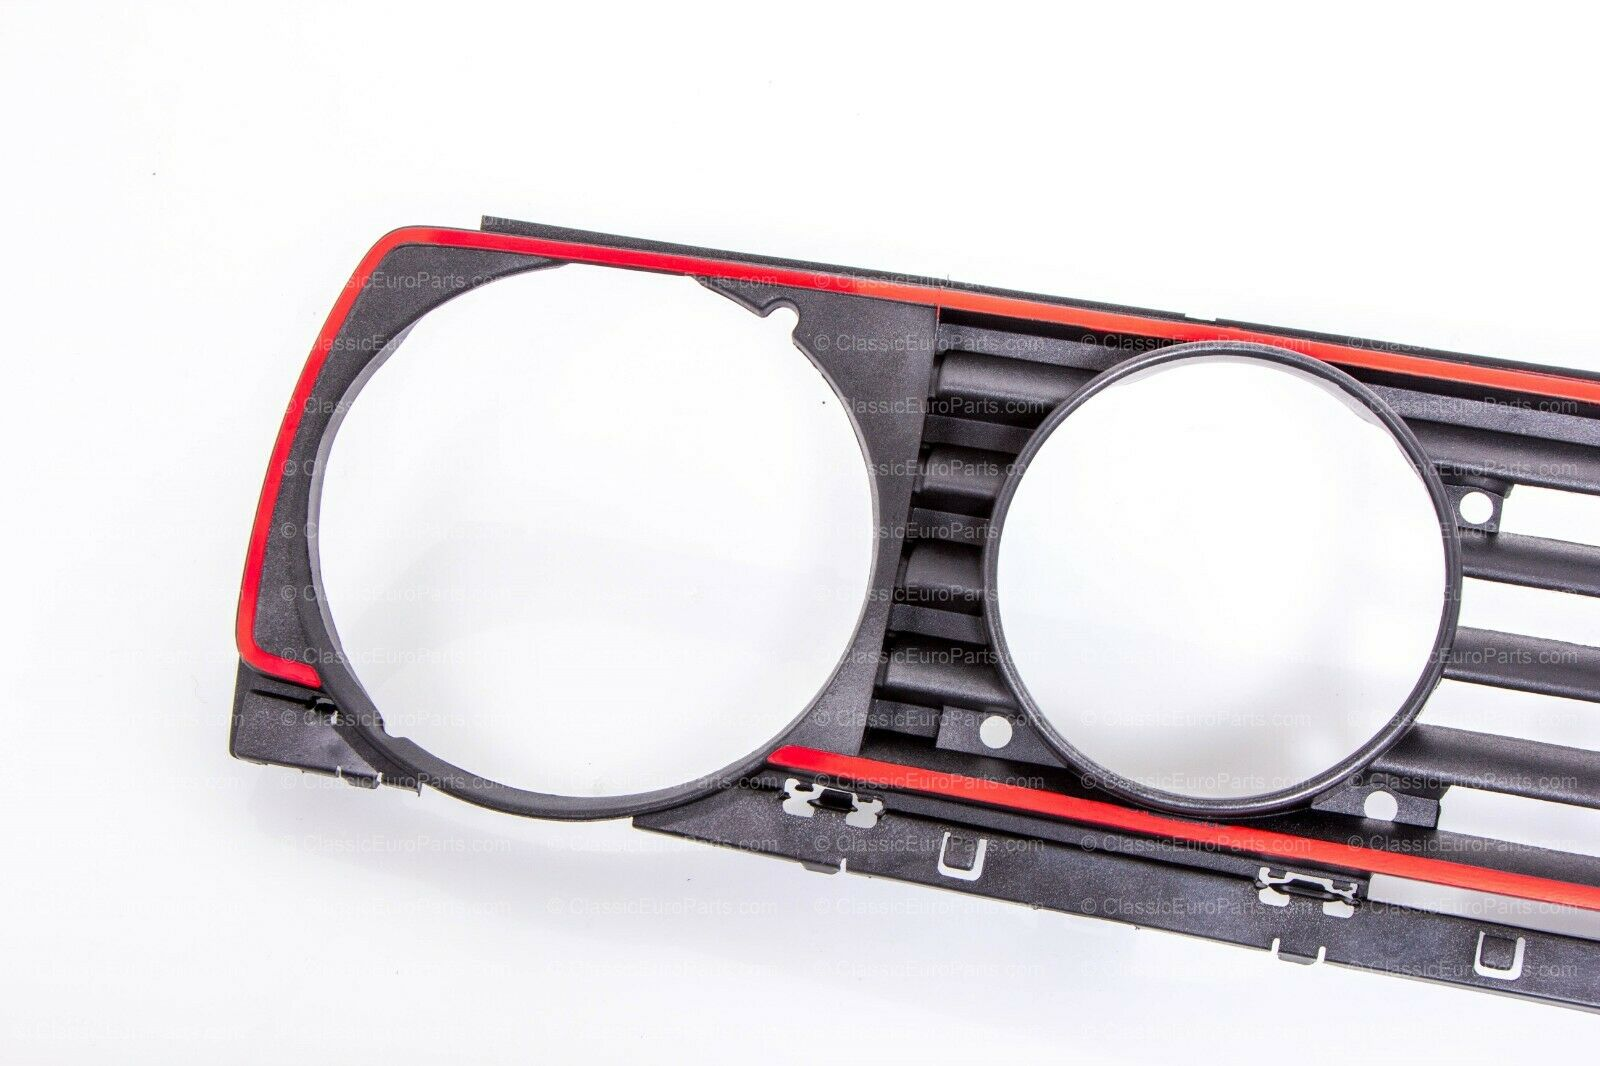 Vw Golf Rabbit Mk2 Euro Gti Quad Headlight Grill Amp Fog